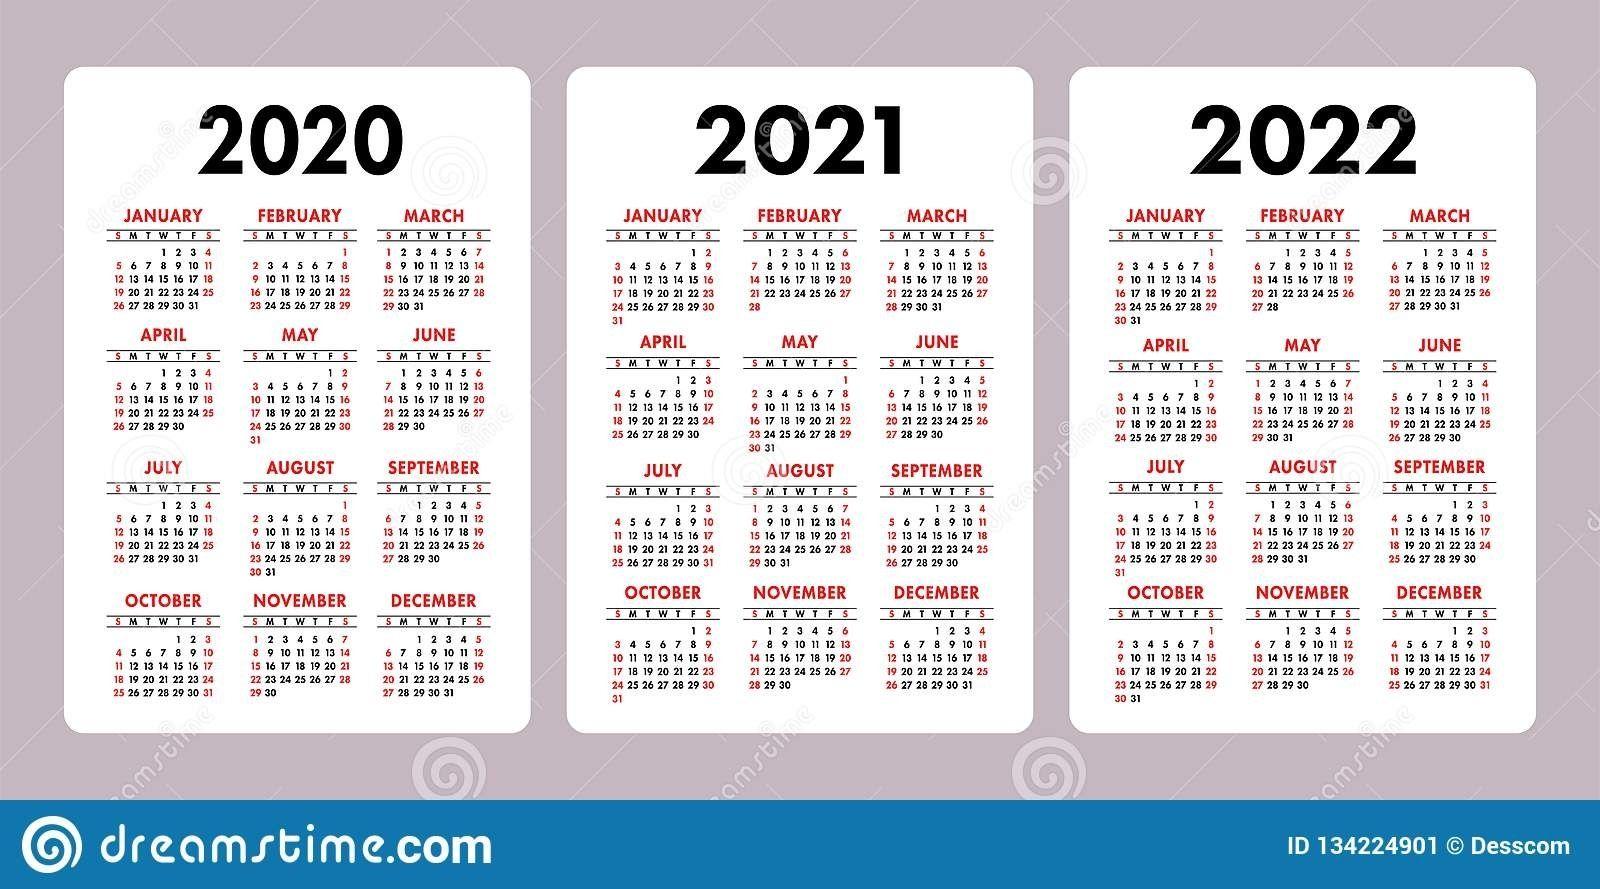 Vertex Calendar 2022.Remarkable Printable Calendars 2020 2022 Marketing Calendar Template Calendar Printables Printable Calendar Template